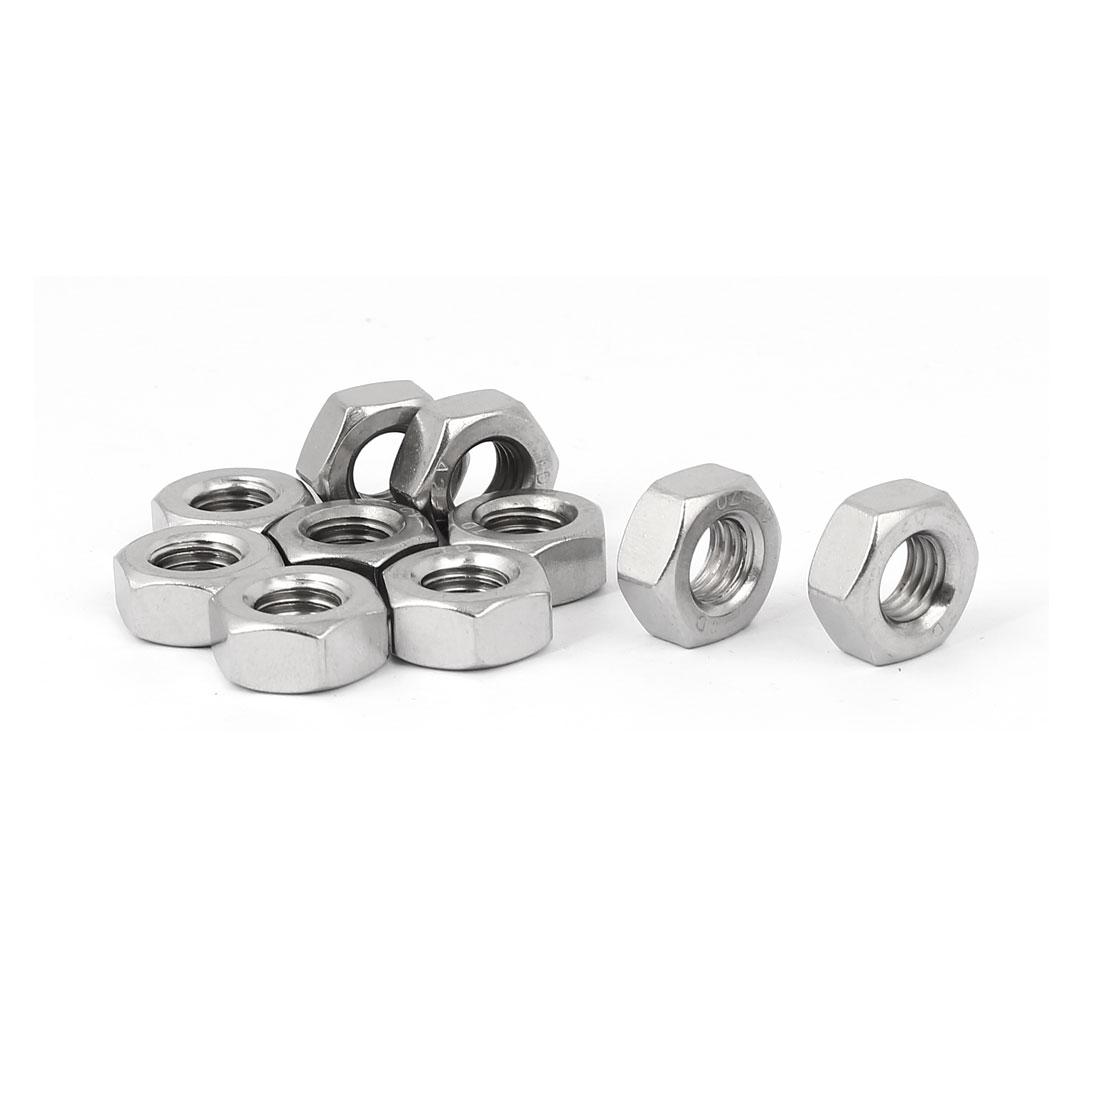 M10 Thread Dia 304 Stainless Steel Hex Nut Screw Cap Fastener Silver Tone 10pcs